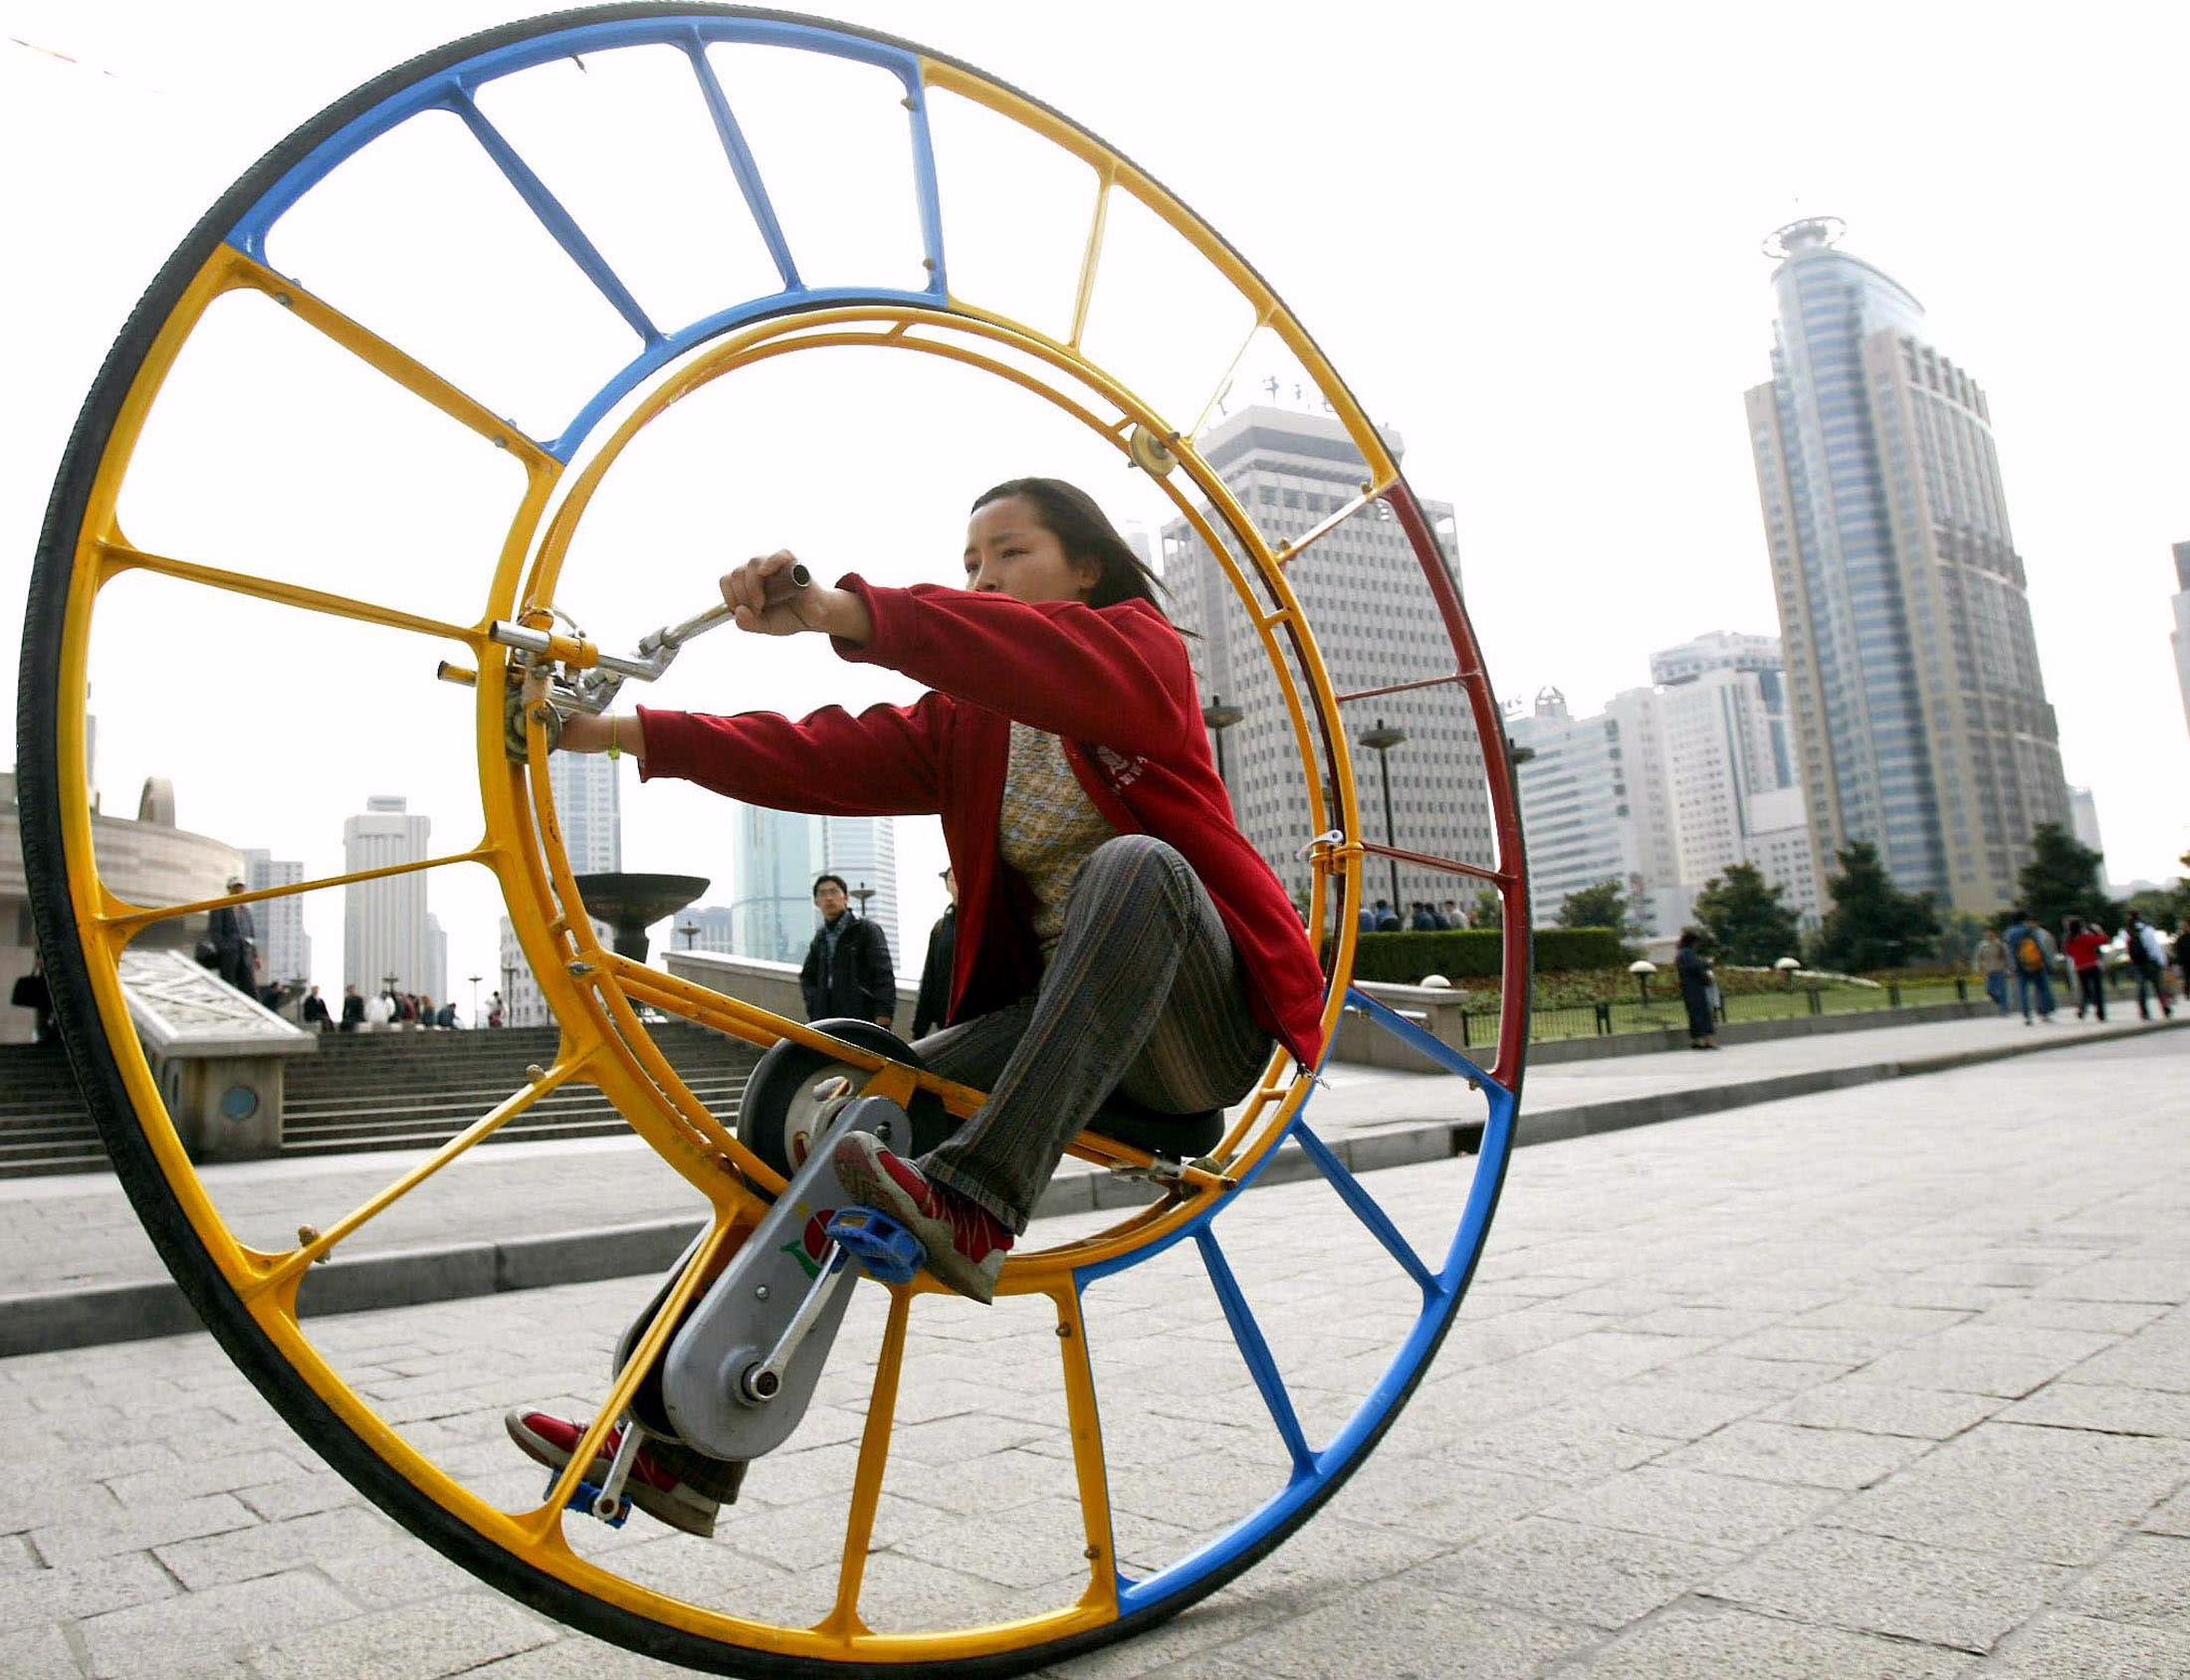 Unusual modes of transportation